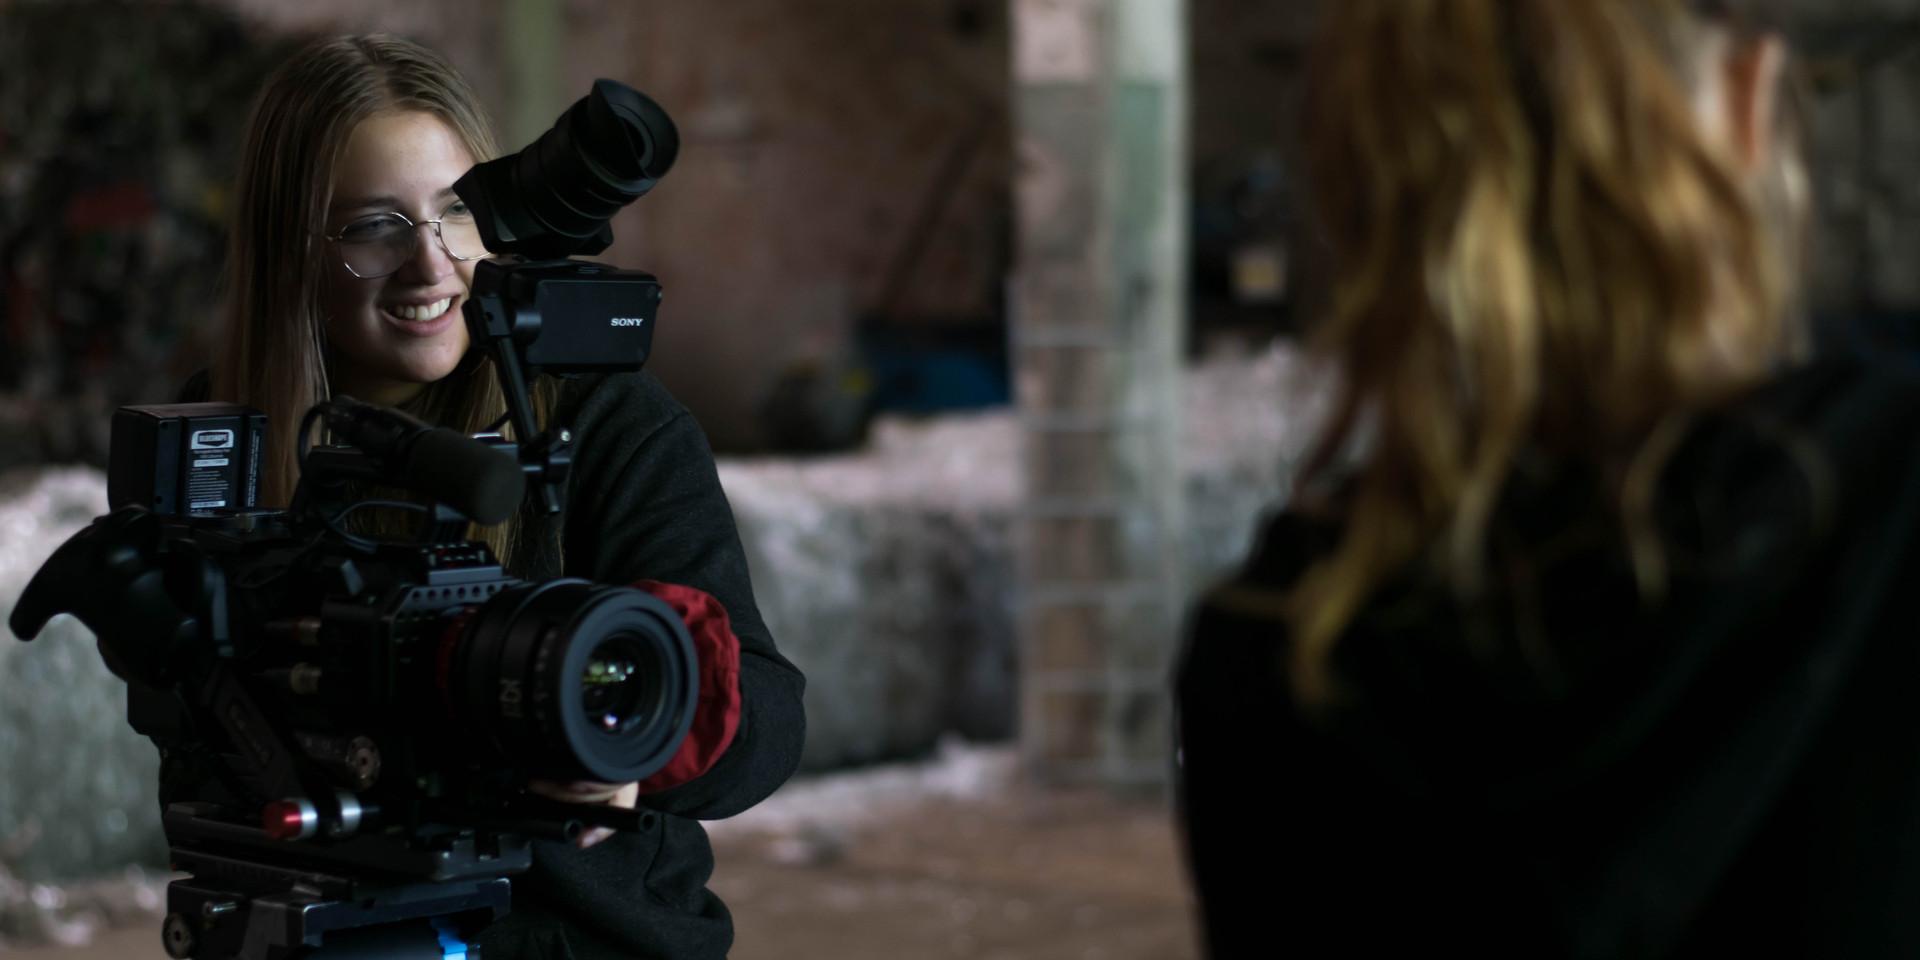 Johanna being the cinematographer and camera operator